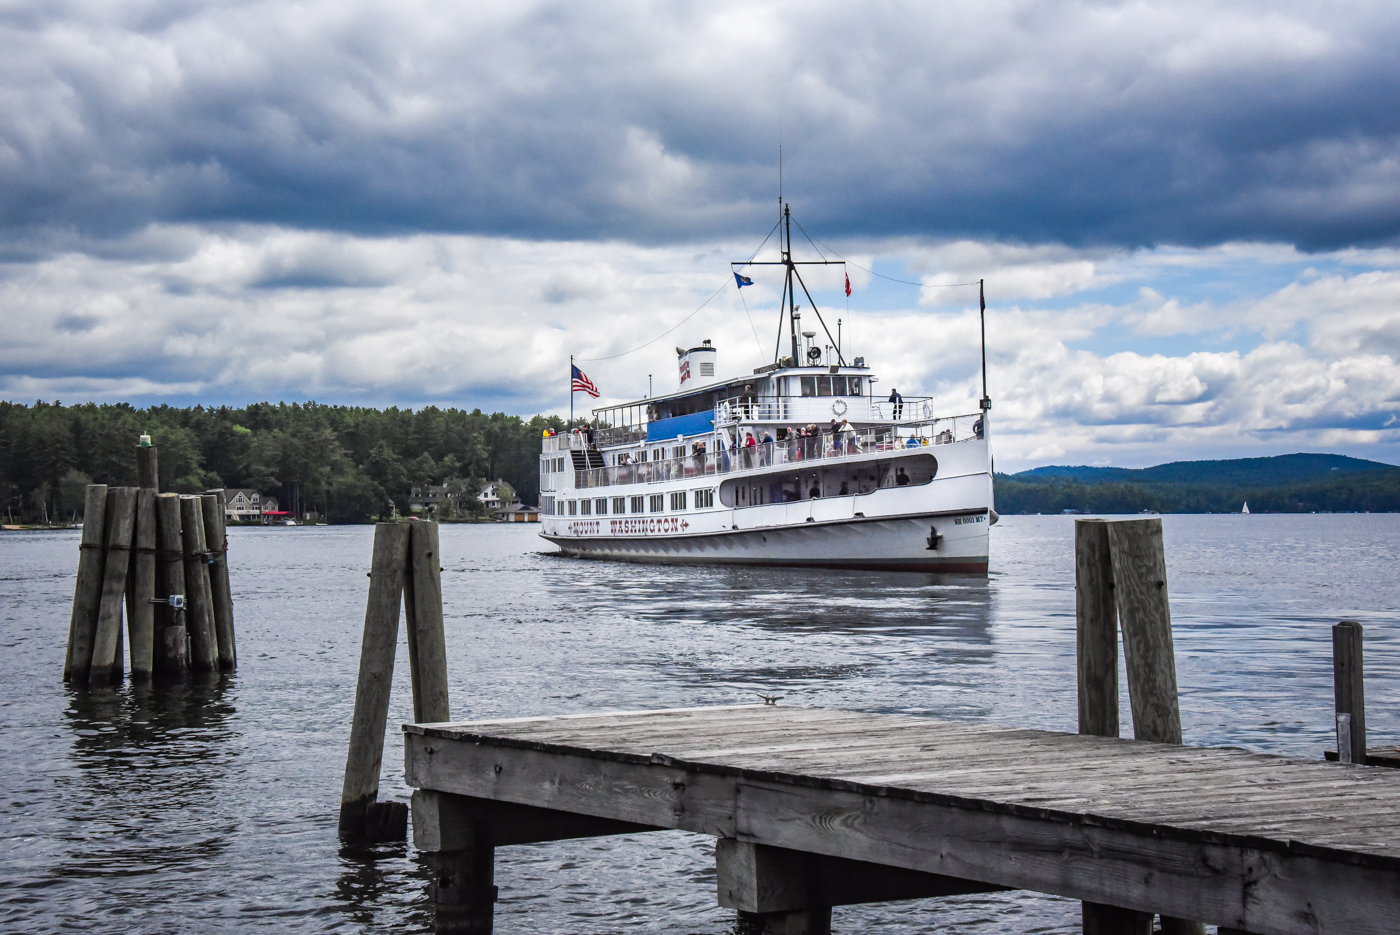 The MS Mount Washington approaches the Wolfeboro Docks